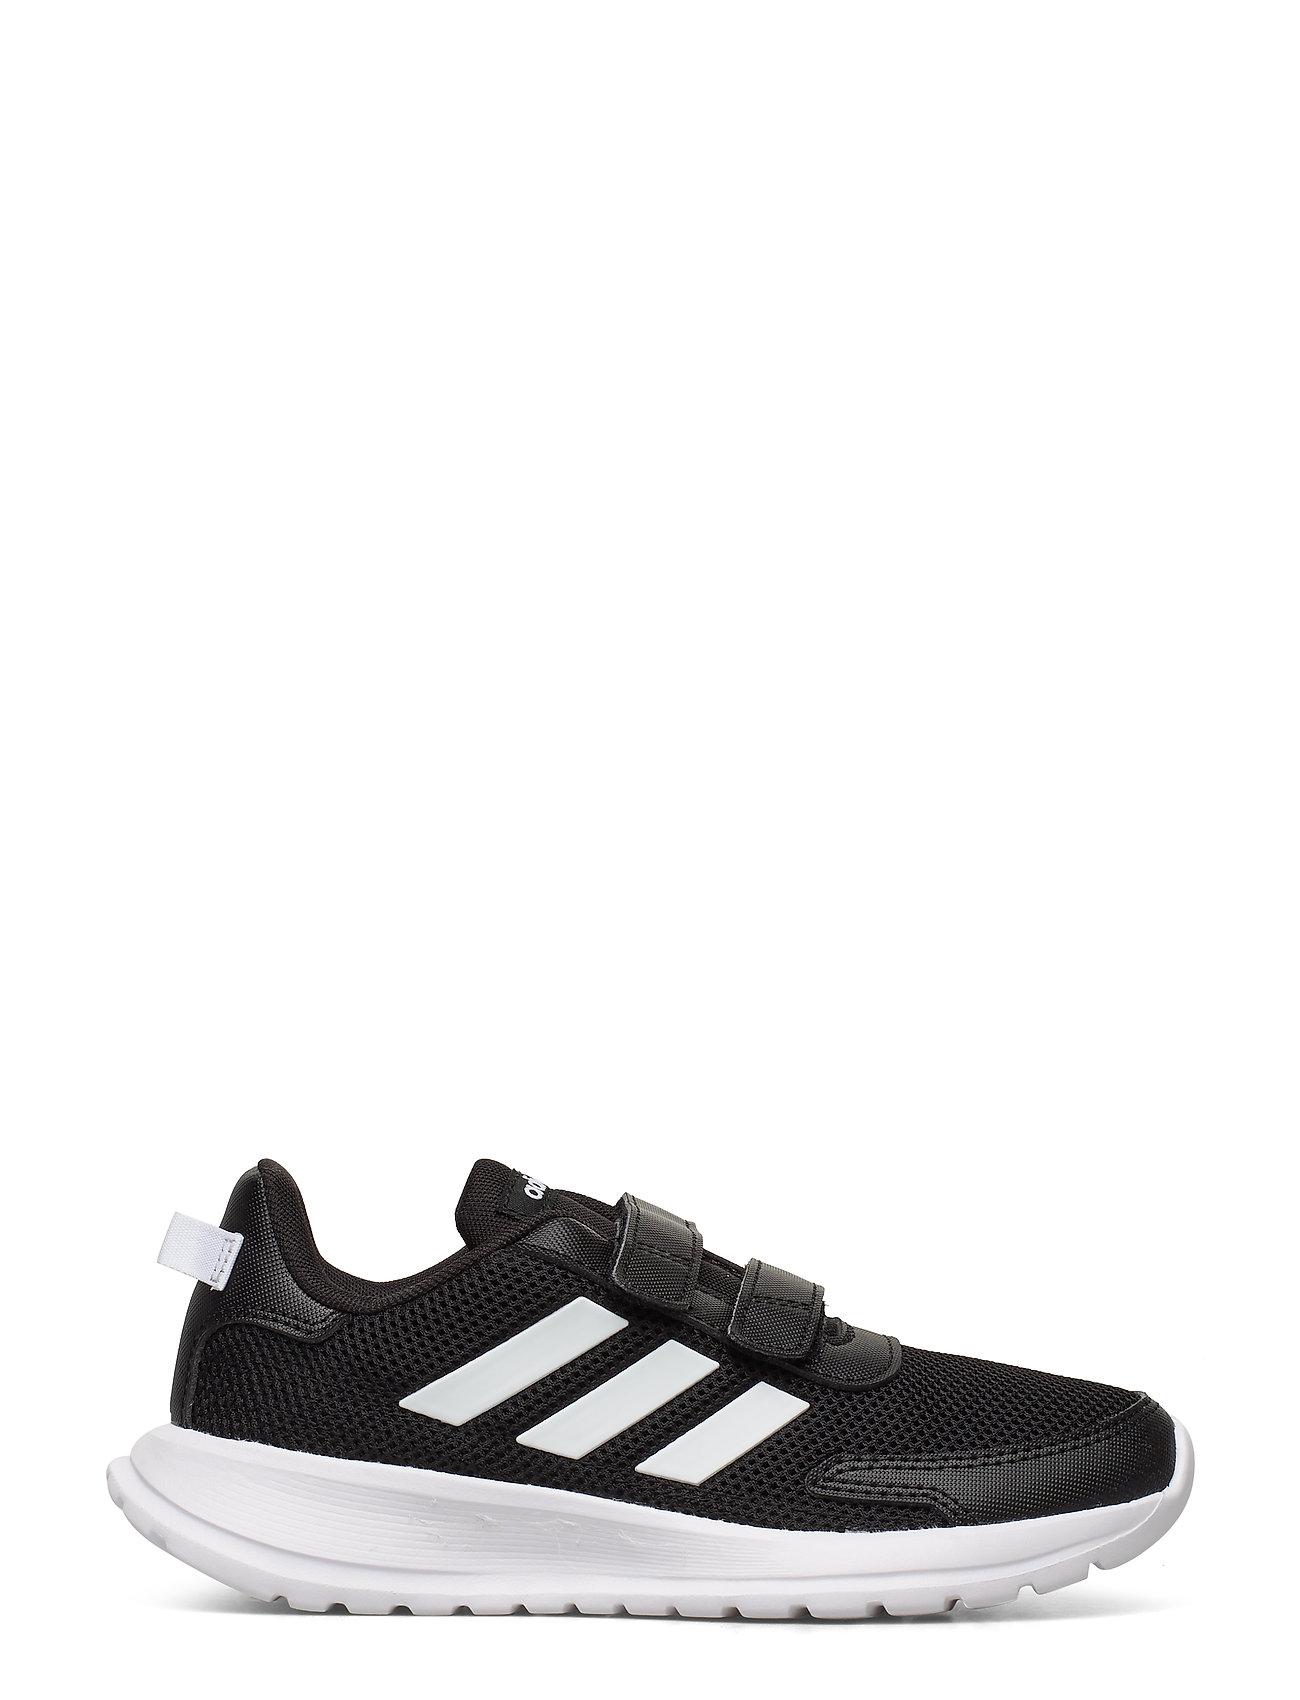 Tensaur Run C Shoes Sports Shoes Running/training Shoes Sort Adidas Performance